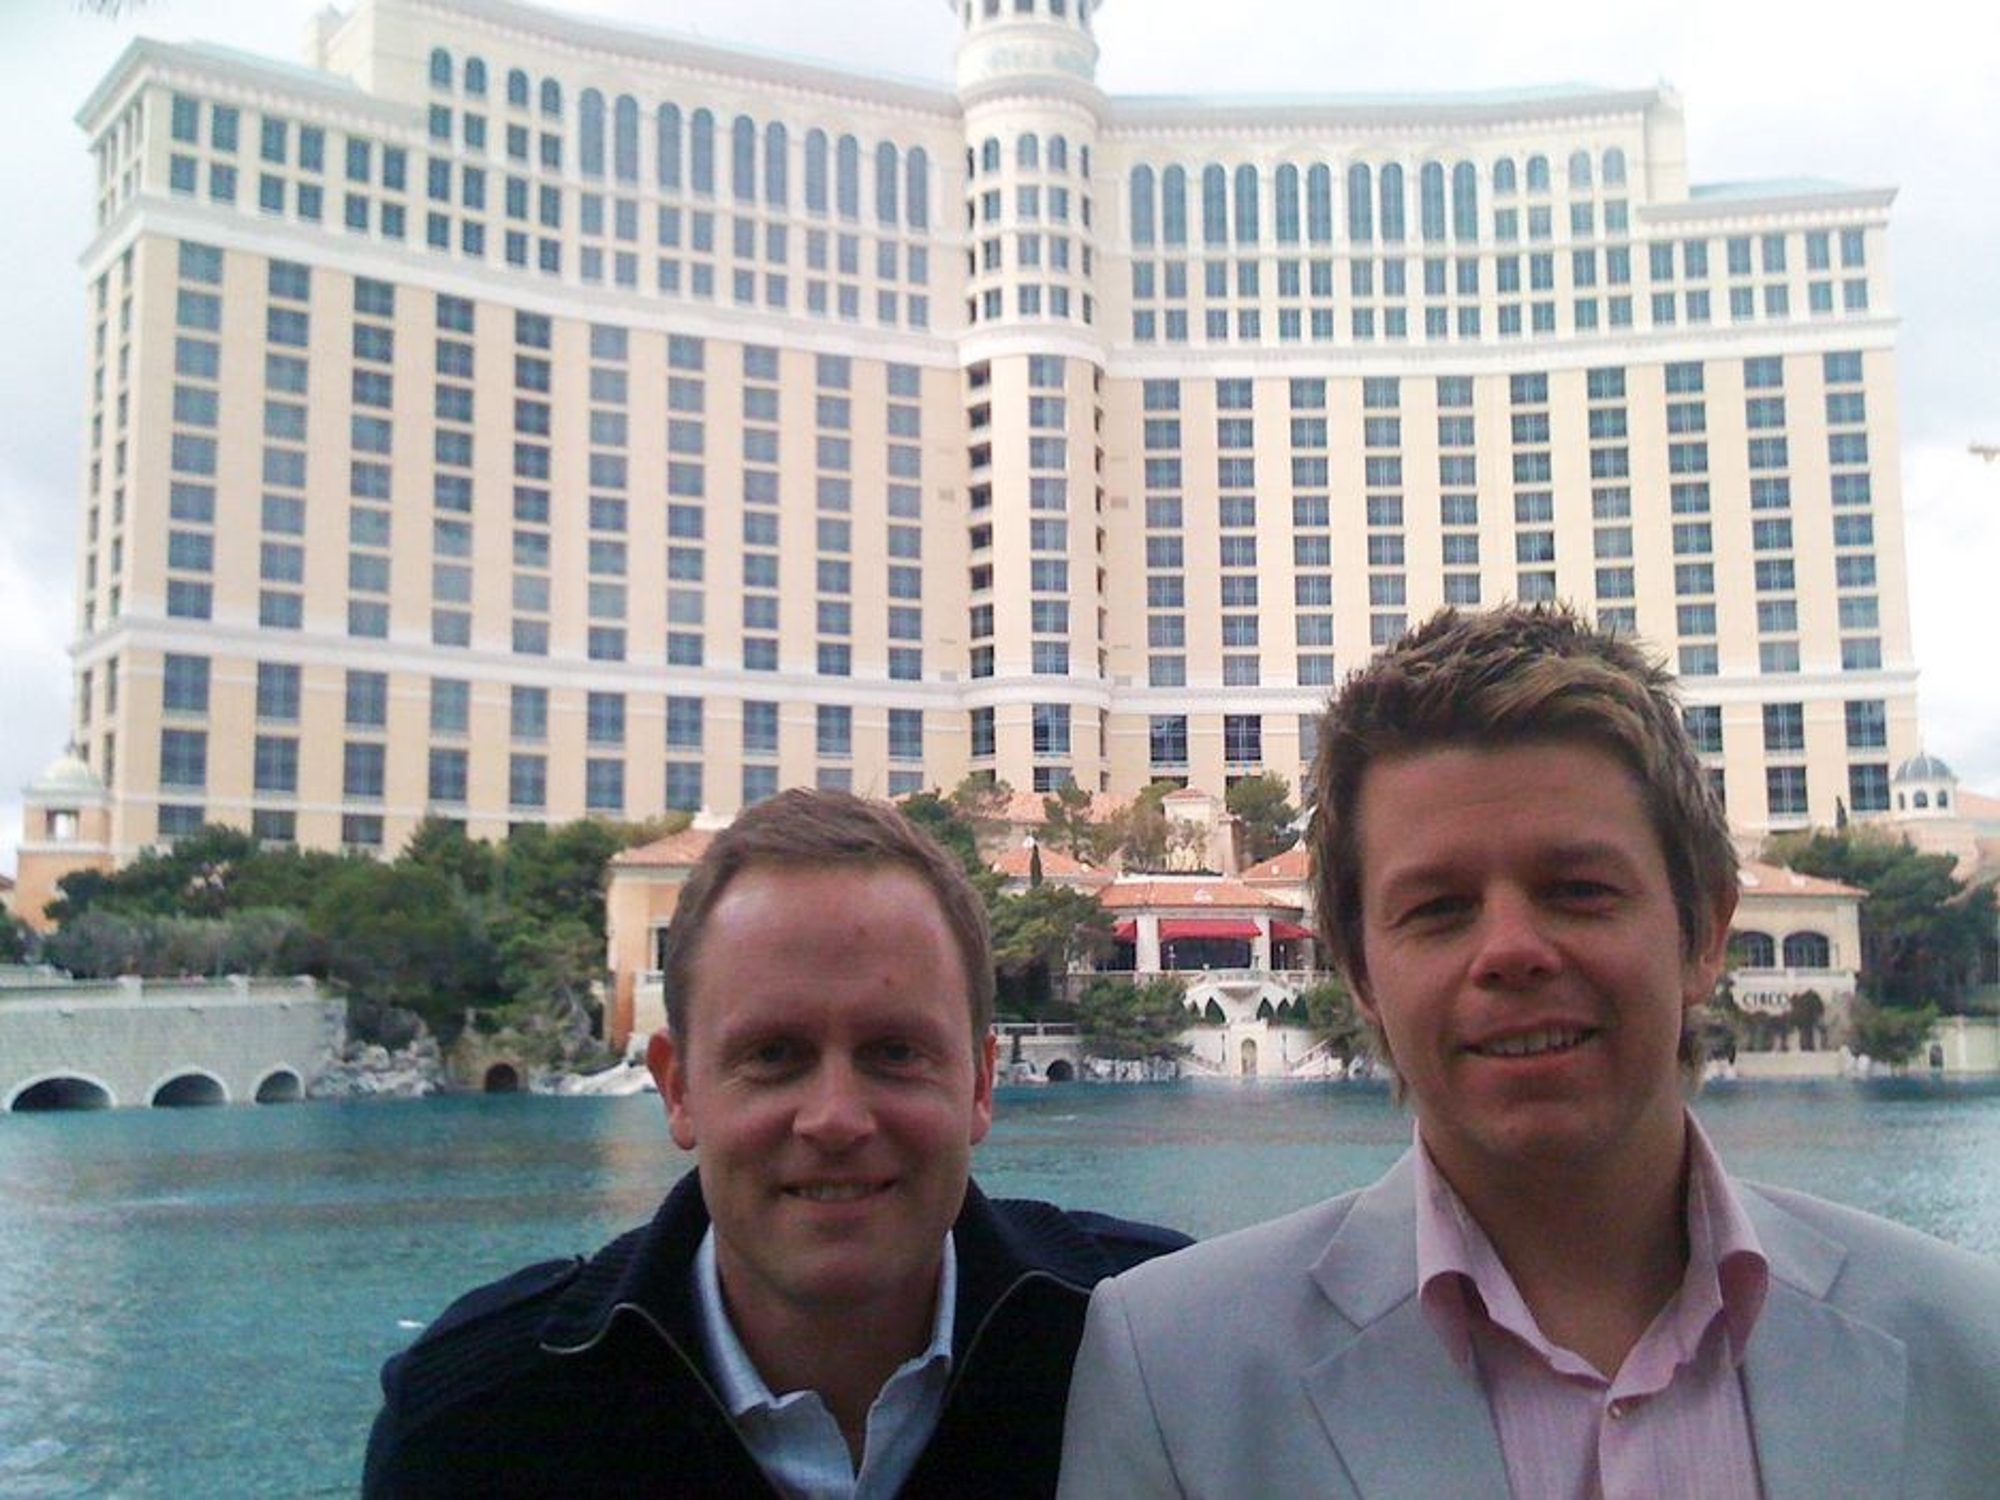 F.v: Adm. dir Jørn Ellefsen og Account Director Norway Morten Medhus i Comperio foran The Mirage i Las Vegas på FAST Forward-konferansen i forrige uke